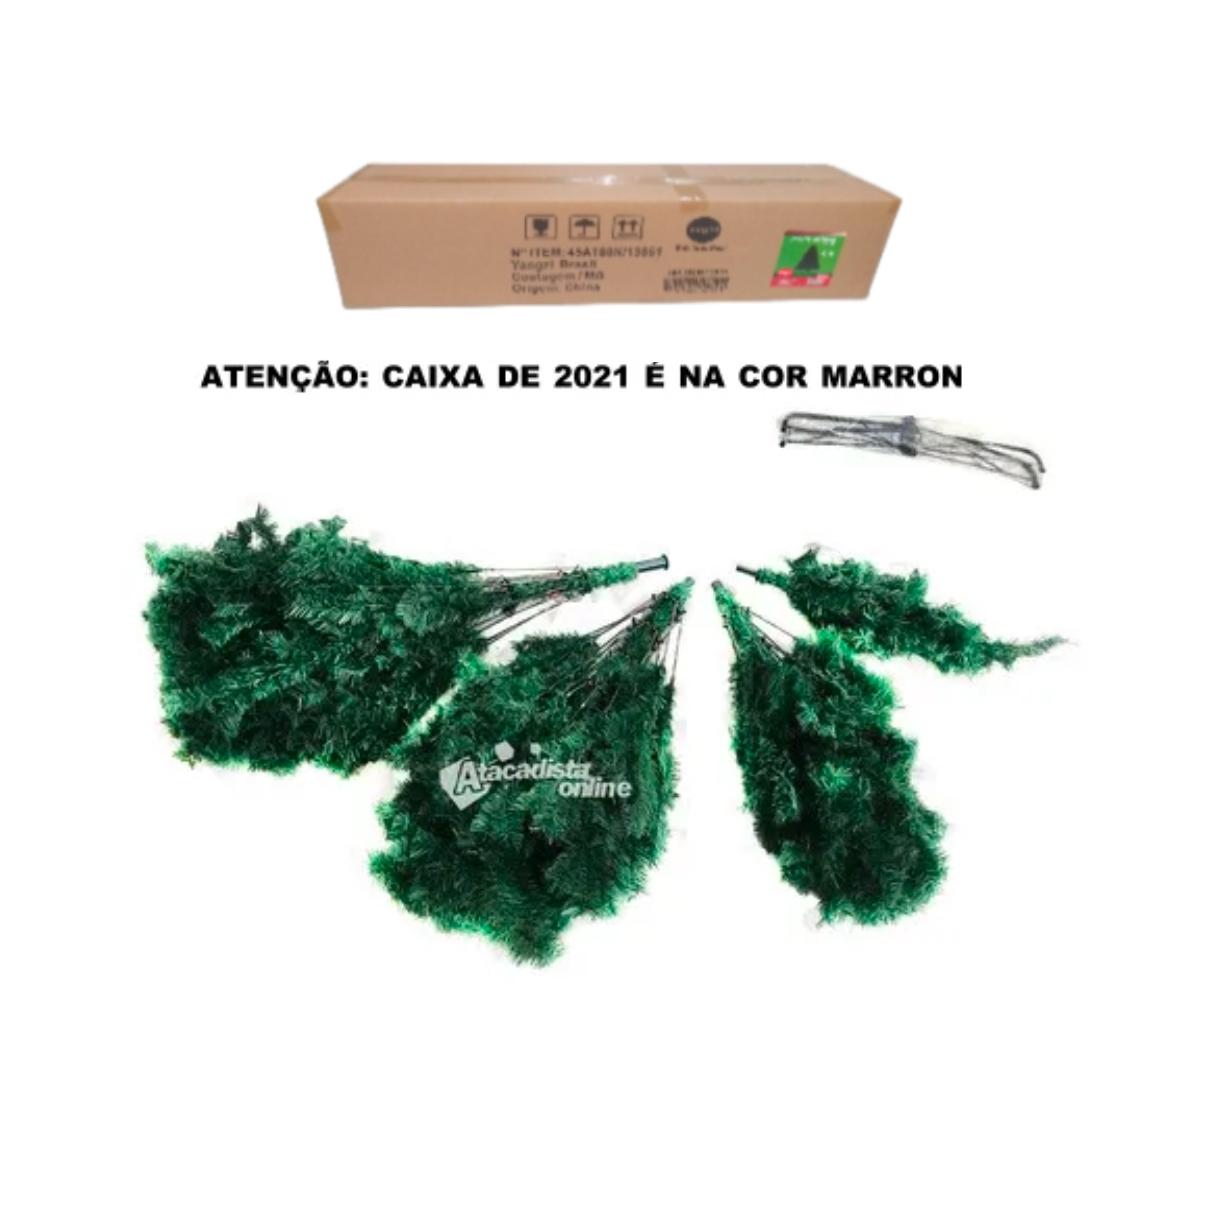 Arvore Natal Big Imperial  2,70m 1890 Gal.  + Ponteira NC